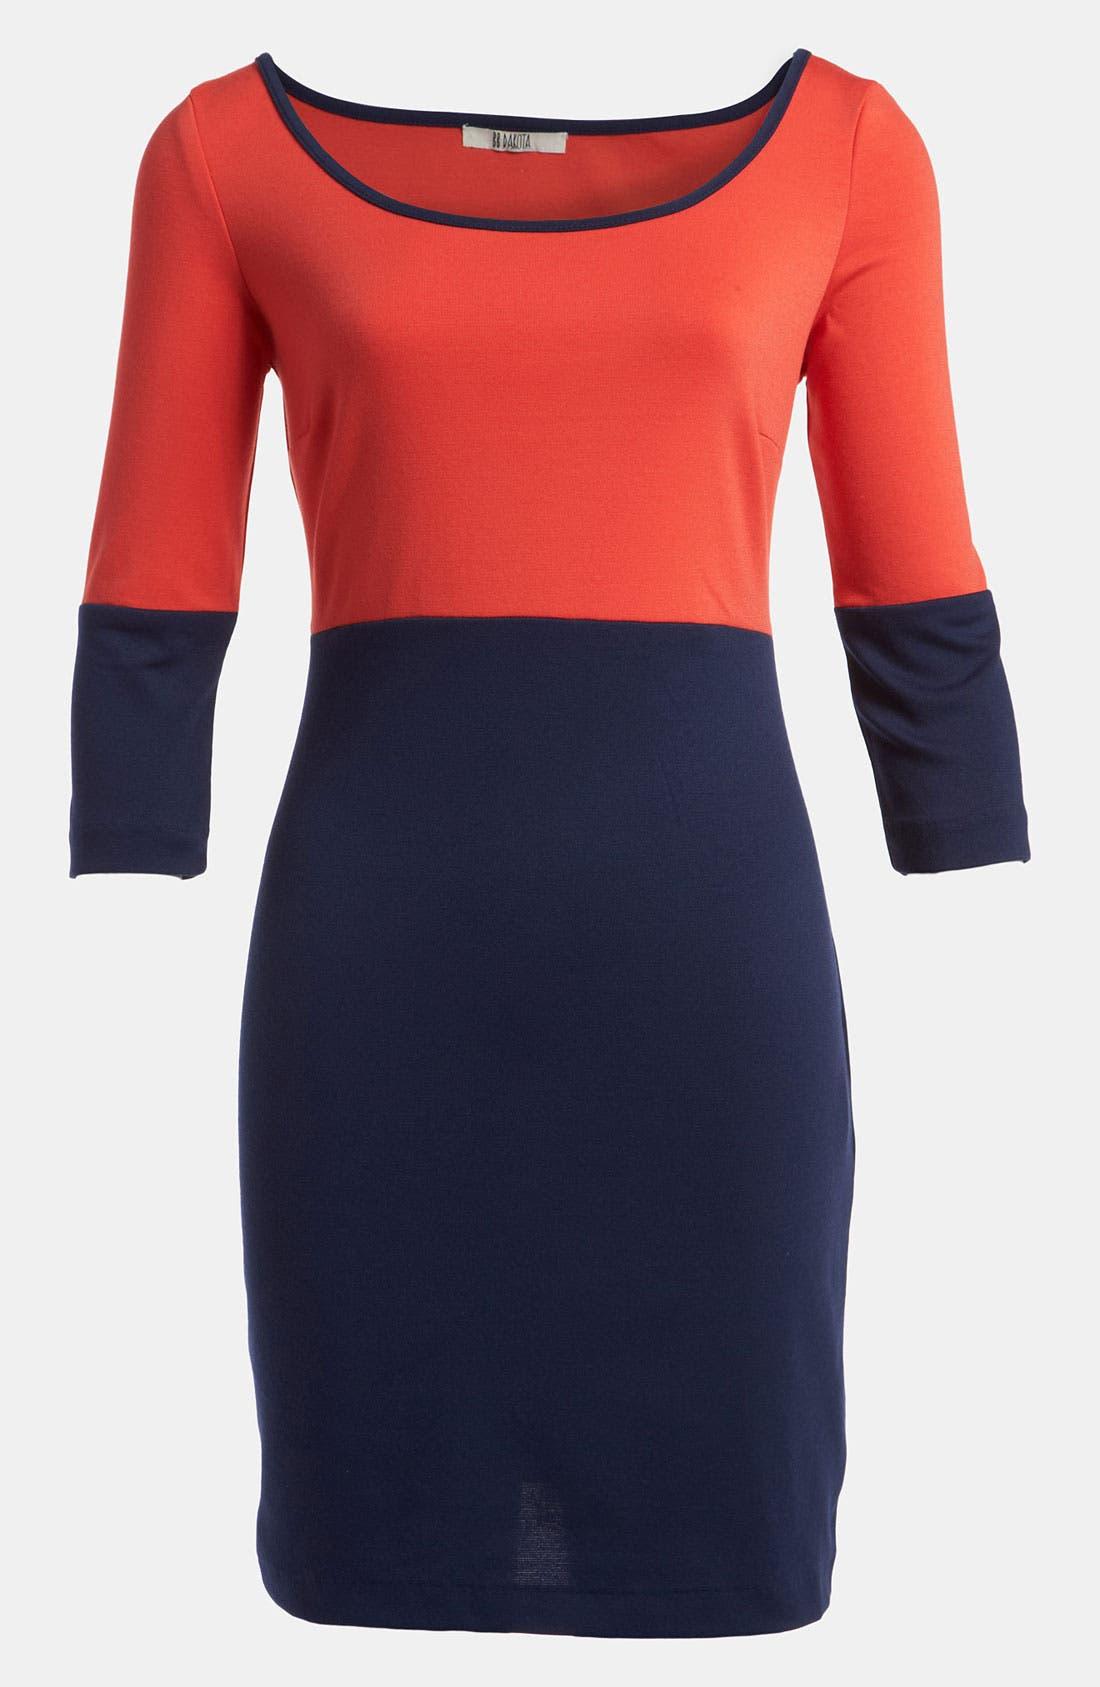 Main Image - BB Dakota Colorblock Knit Dress